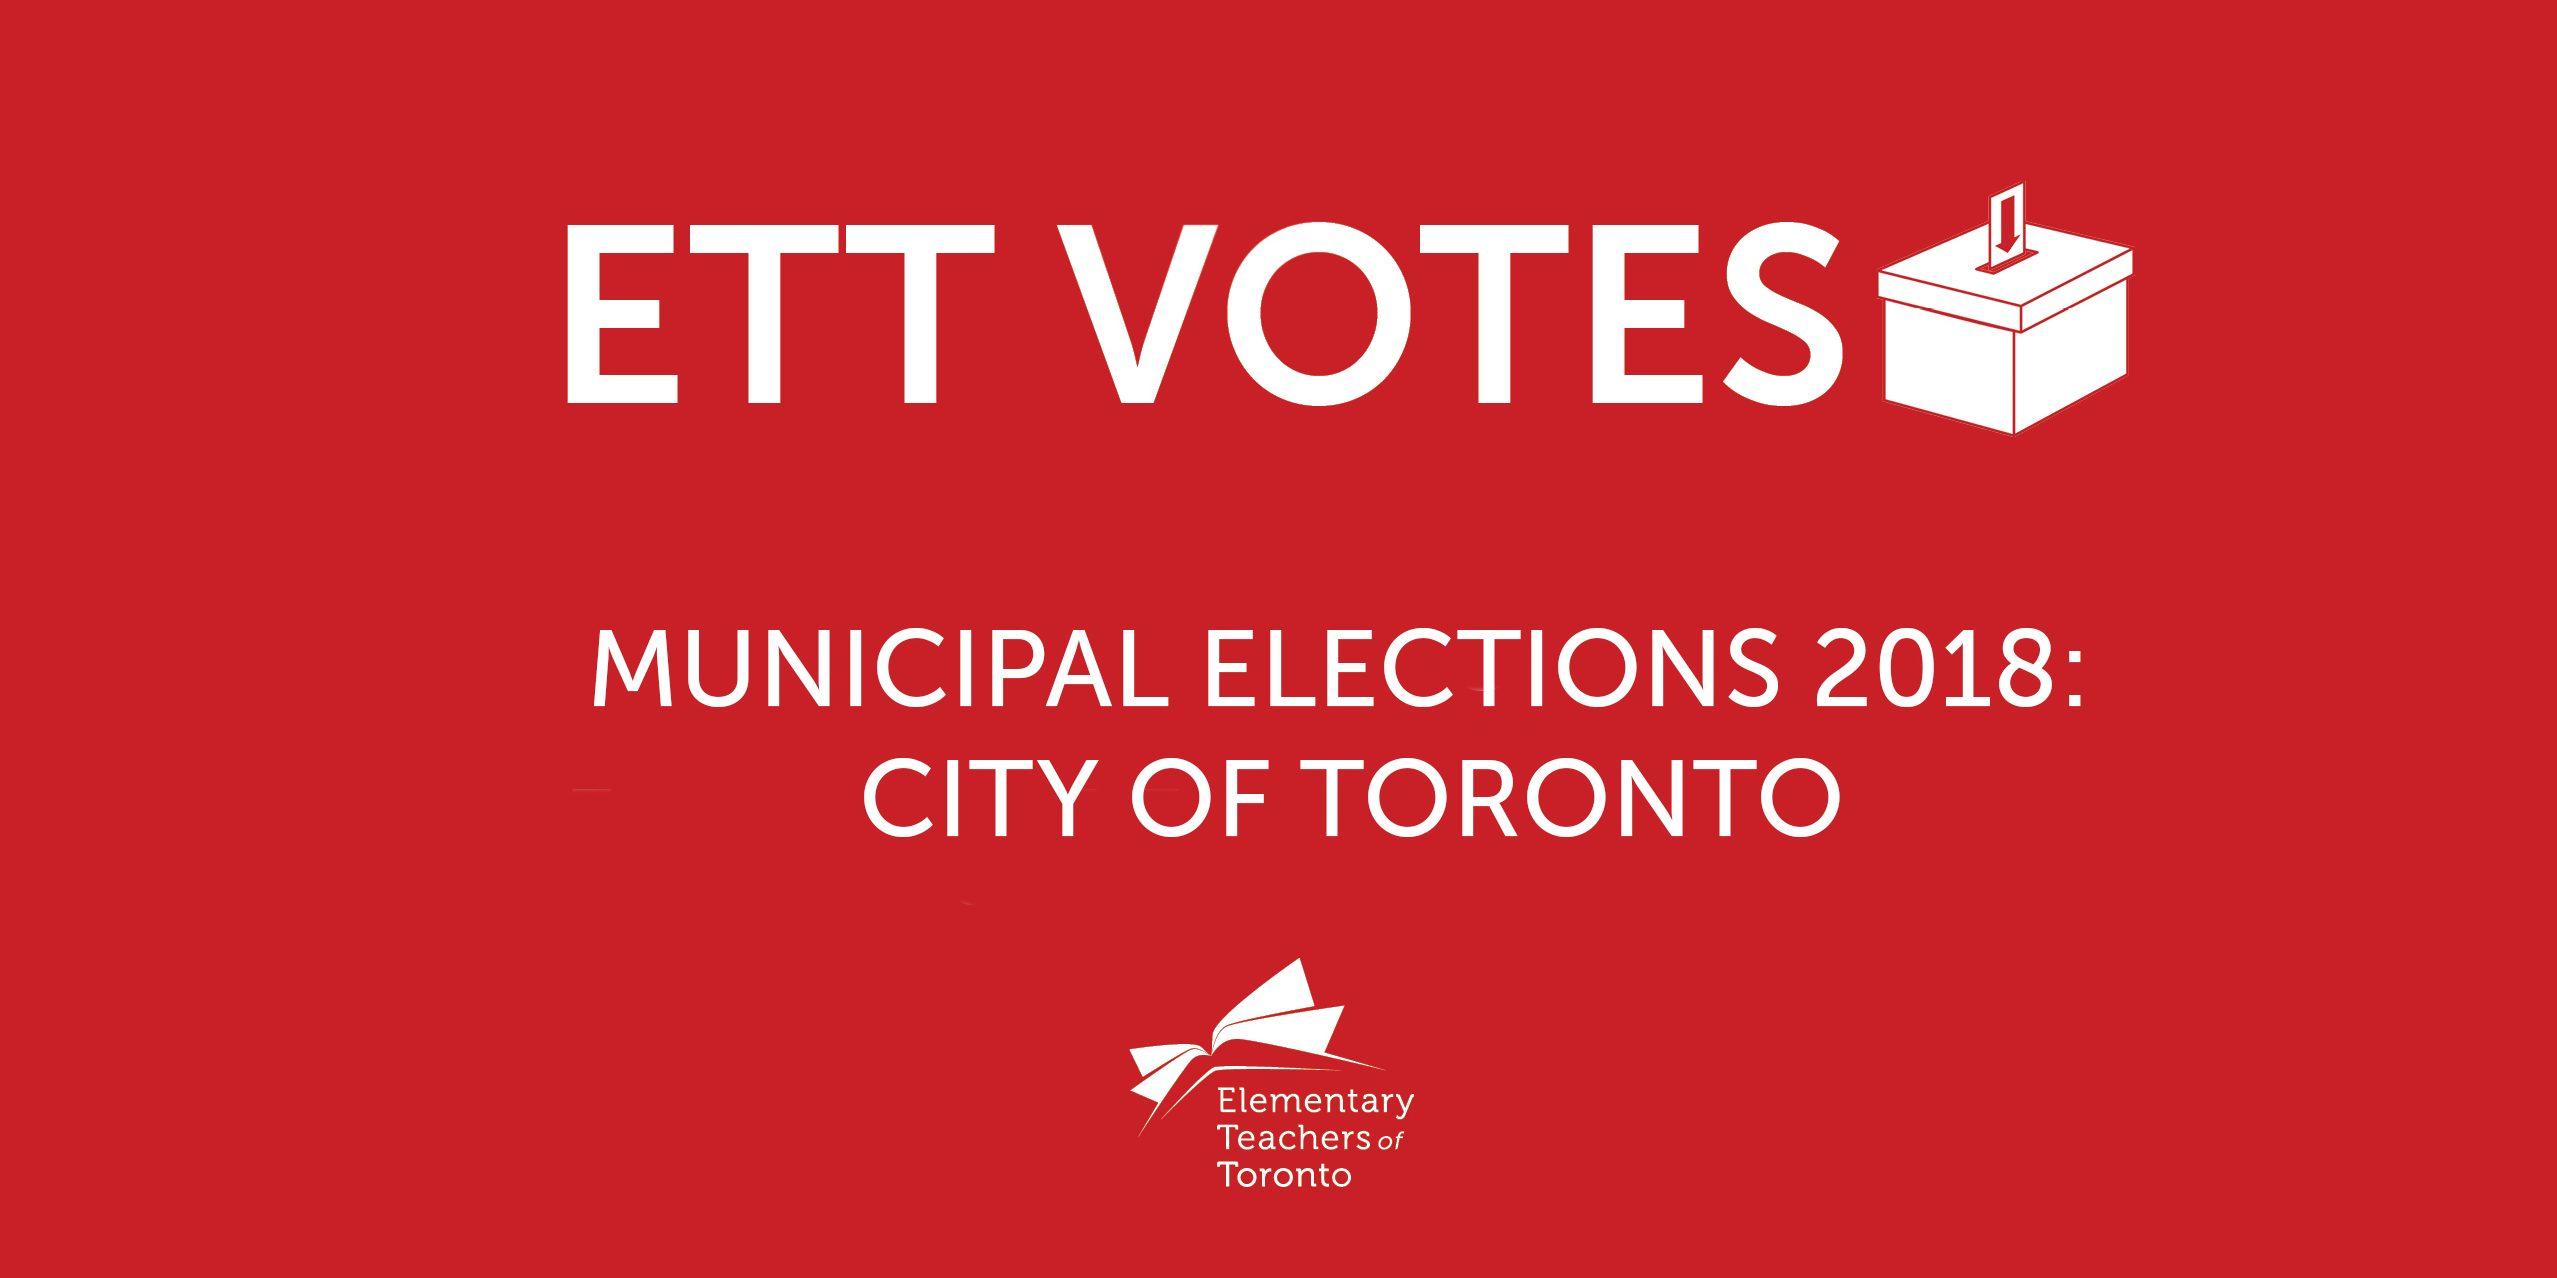 City of Toronto Municipal Election: October 22, 2018